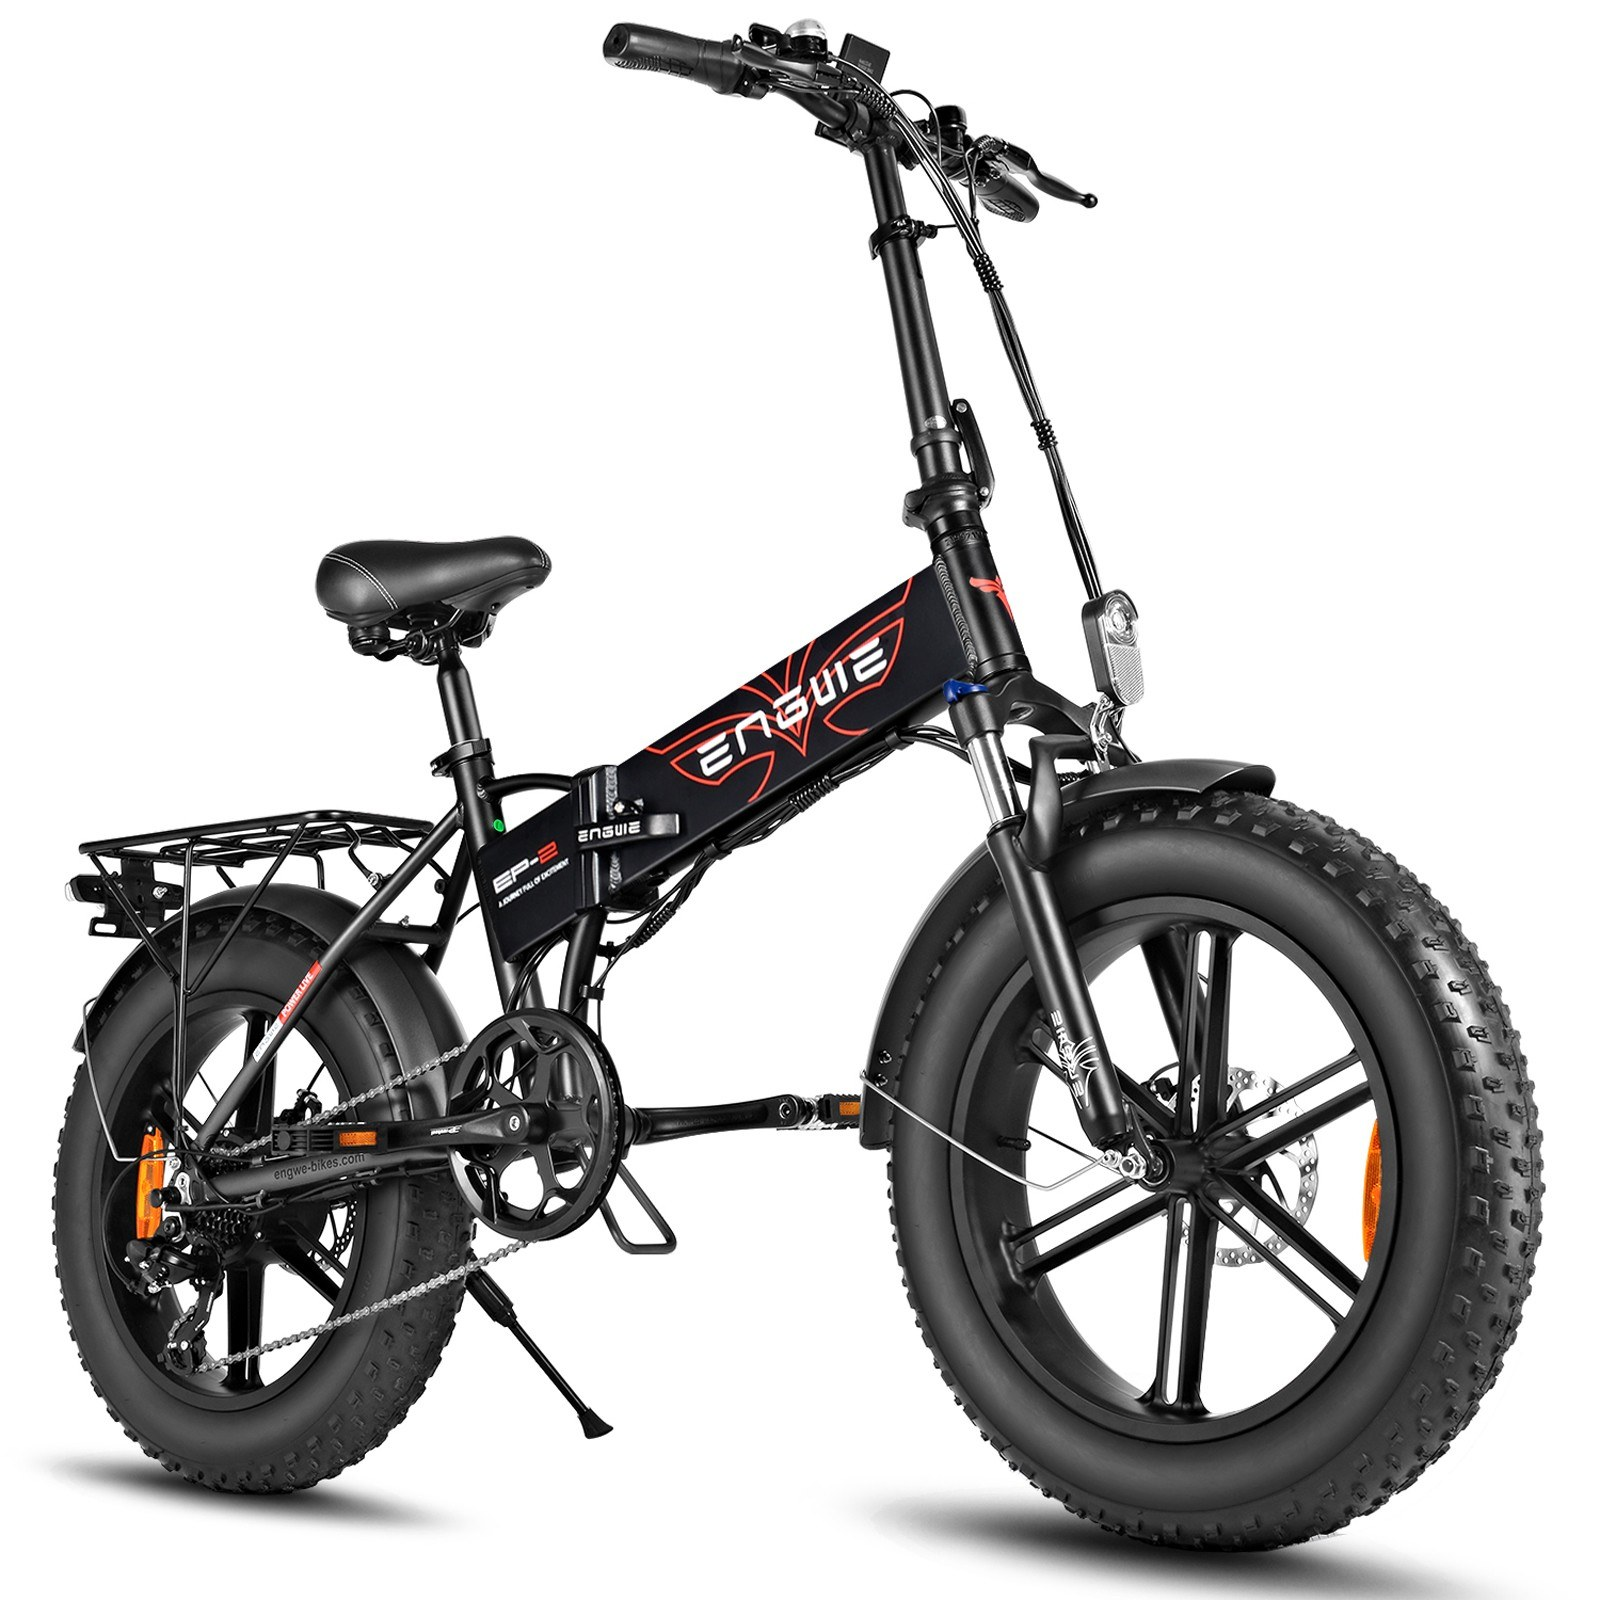 tomtop.com - [EU Warehouse] 41% OFF ENGWE EP-2 PRO 20 Inch 750W Folding Electric Snow Bike 12.8AH 60-80km Range, $1105.87 (Inclusive of VAT)